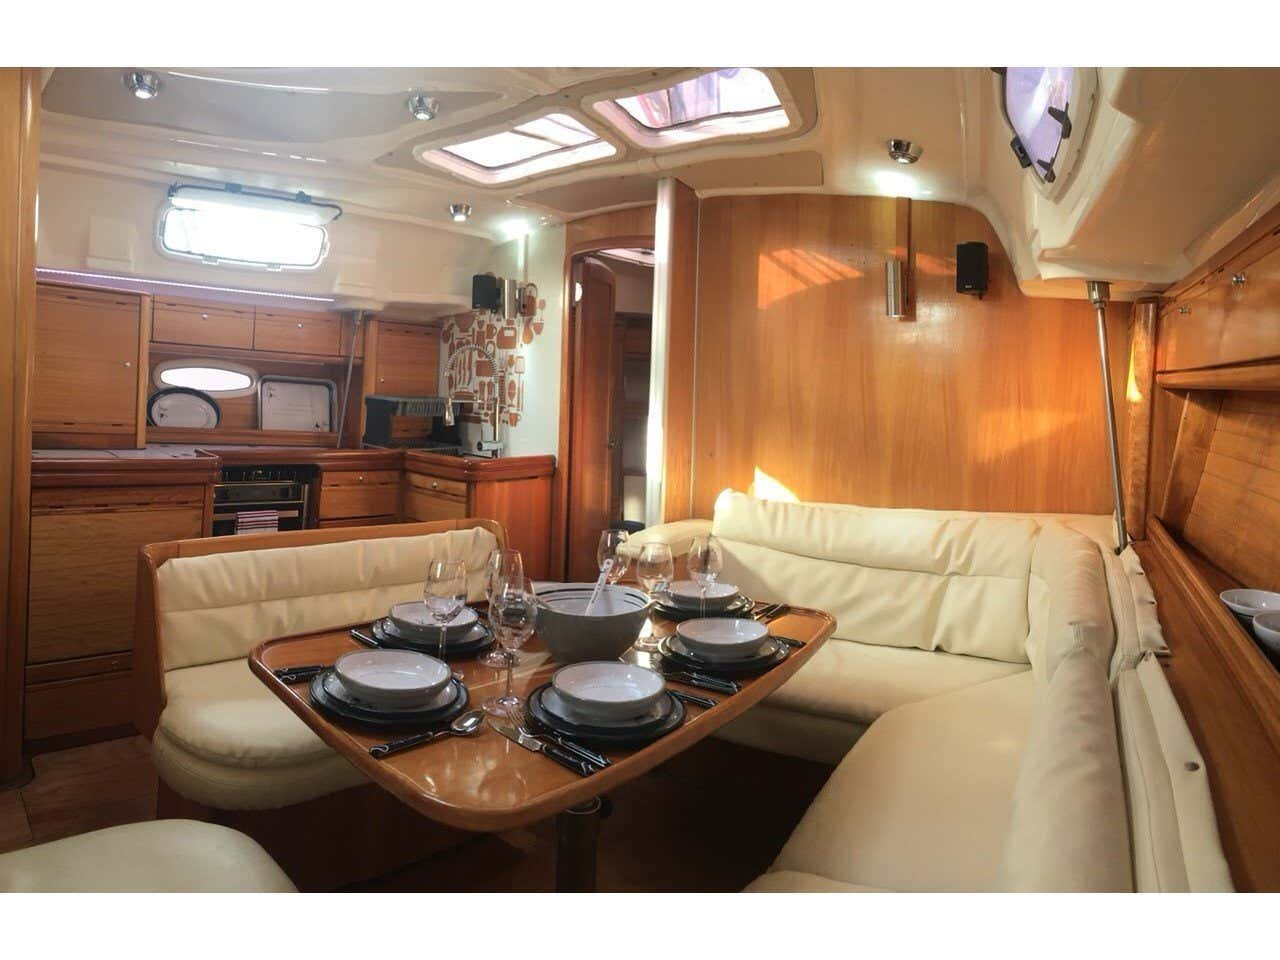 Bavaria 42 Cruiser (Serenity) Interior image - 8